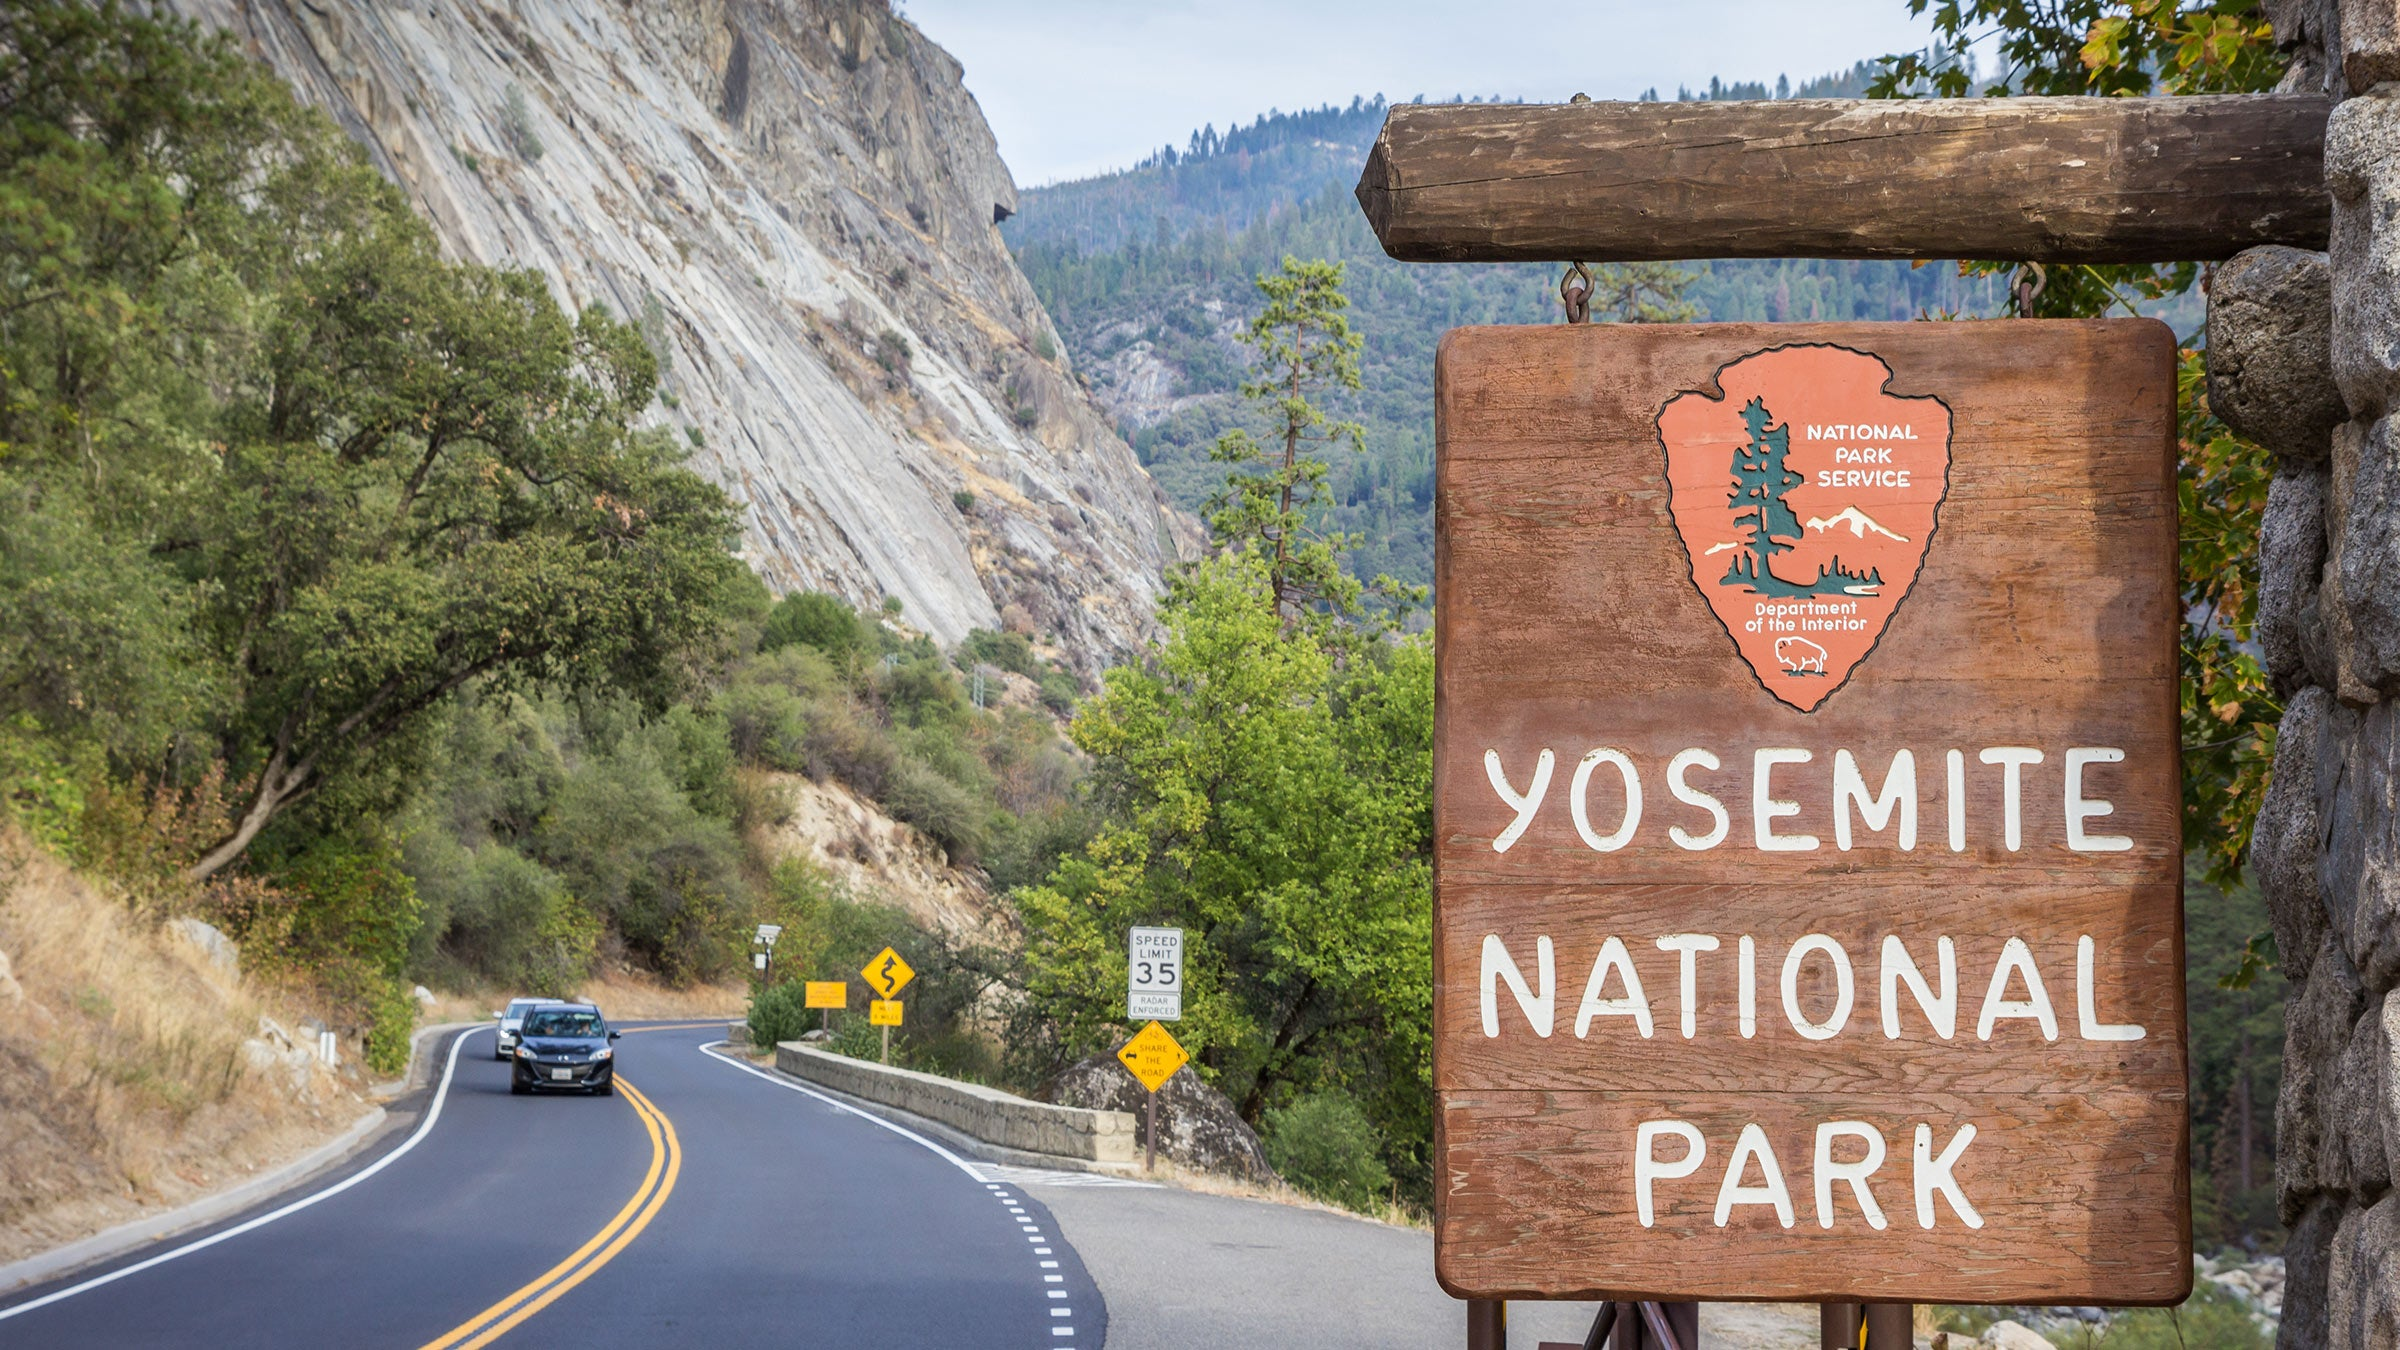 69-Year-Old Hiker Missing In Yosemite